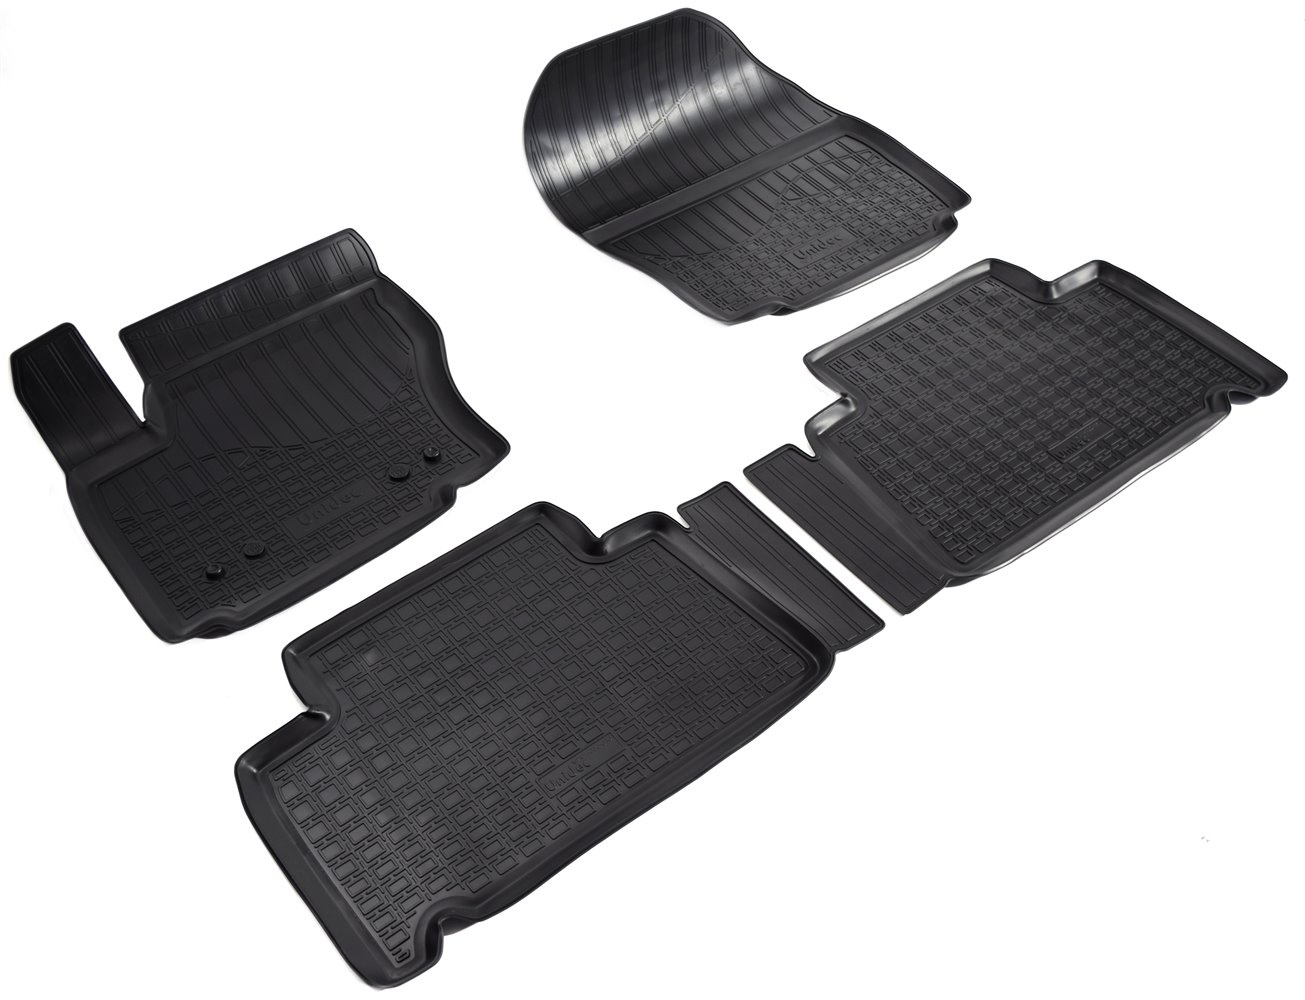 Коврики в салон Norplast для Ford S-Max WA6 2006, для Ford Galaxy II WA6 2006, NPA11-C22-650, черный jane donnelly max s proposal